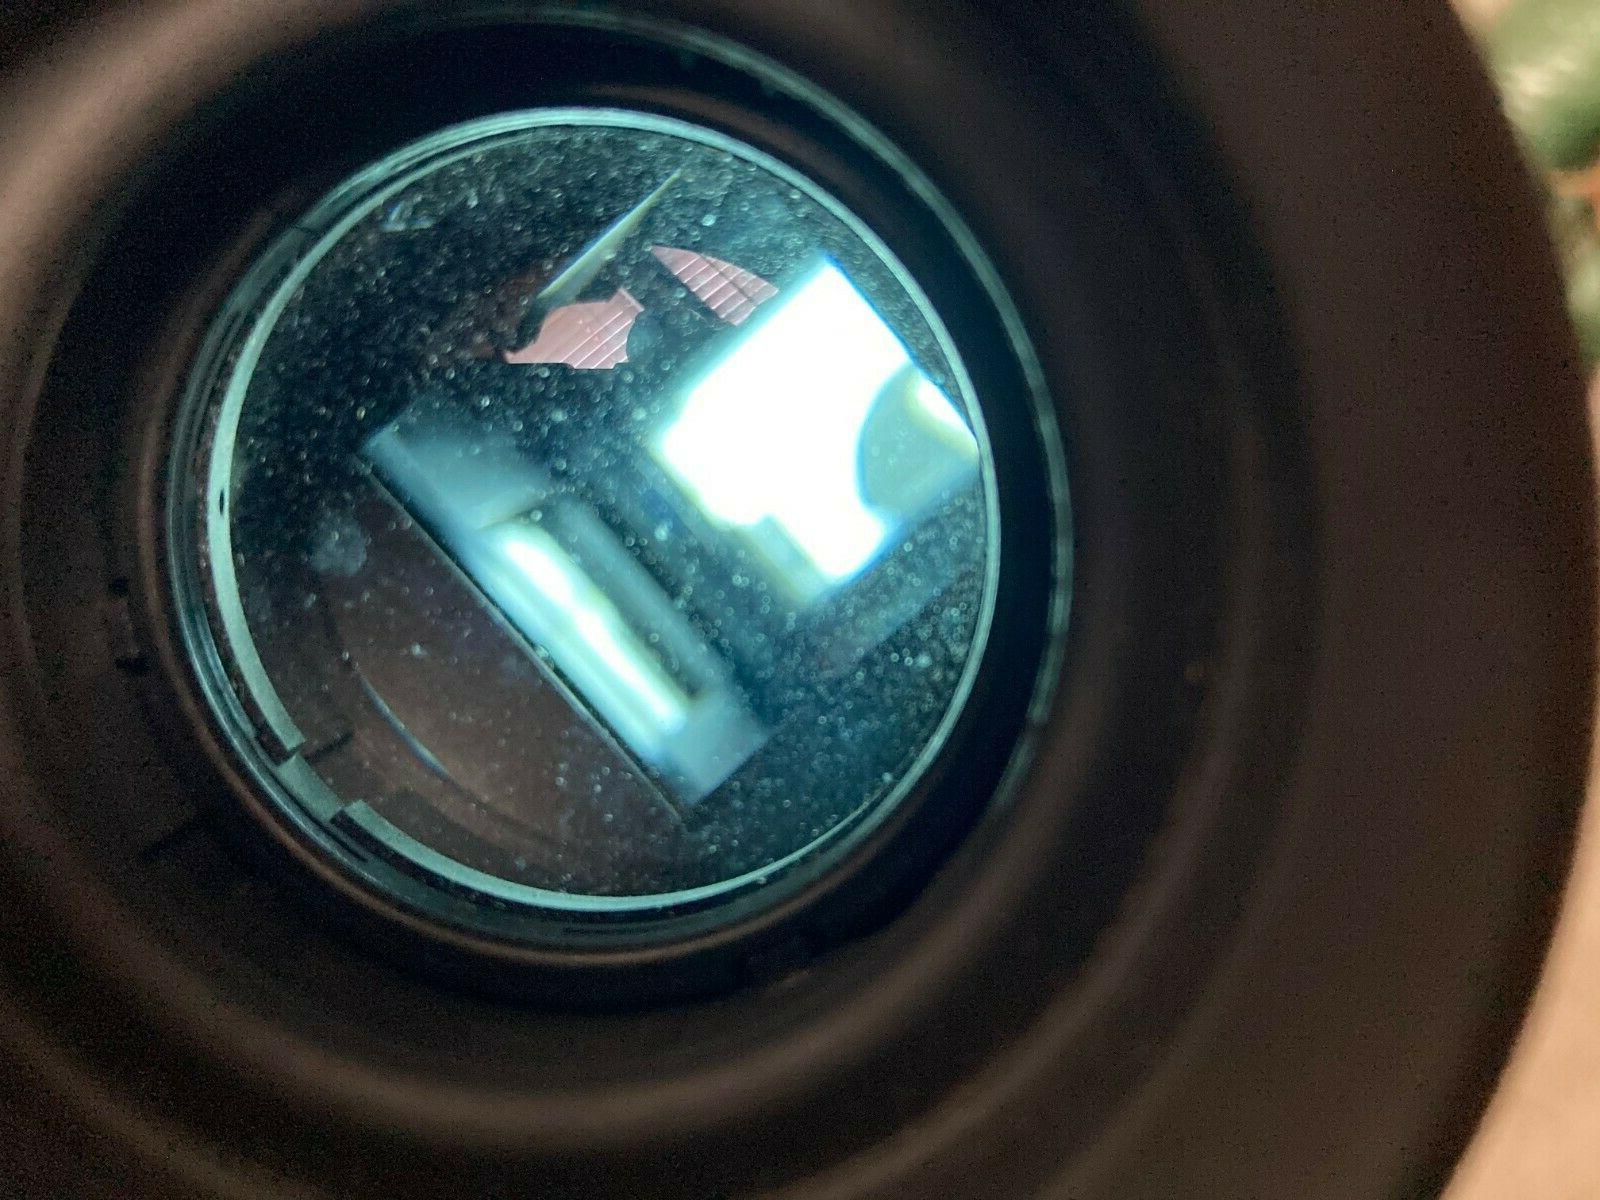 SONYdxc-327a camera lens